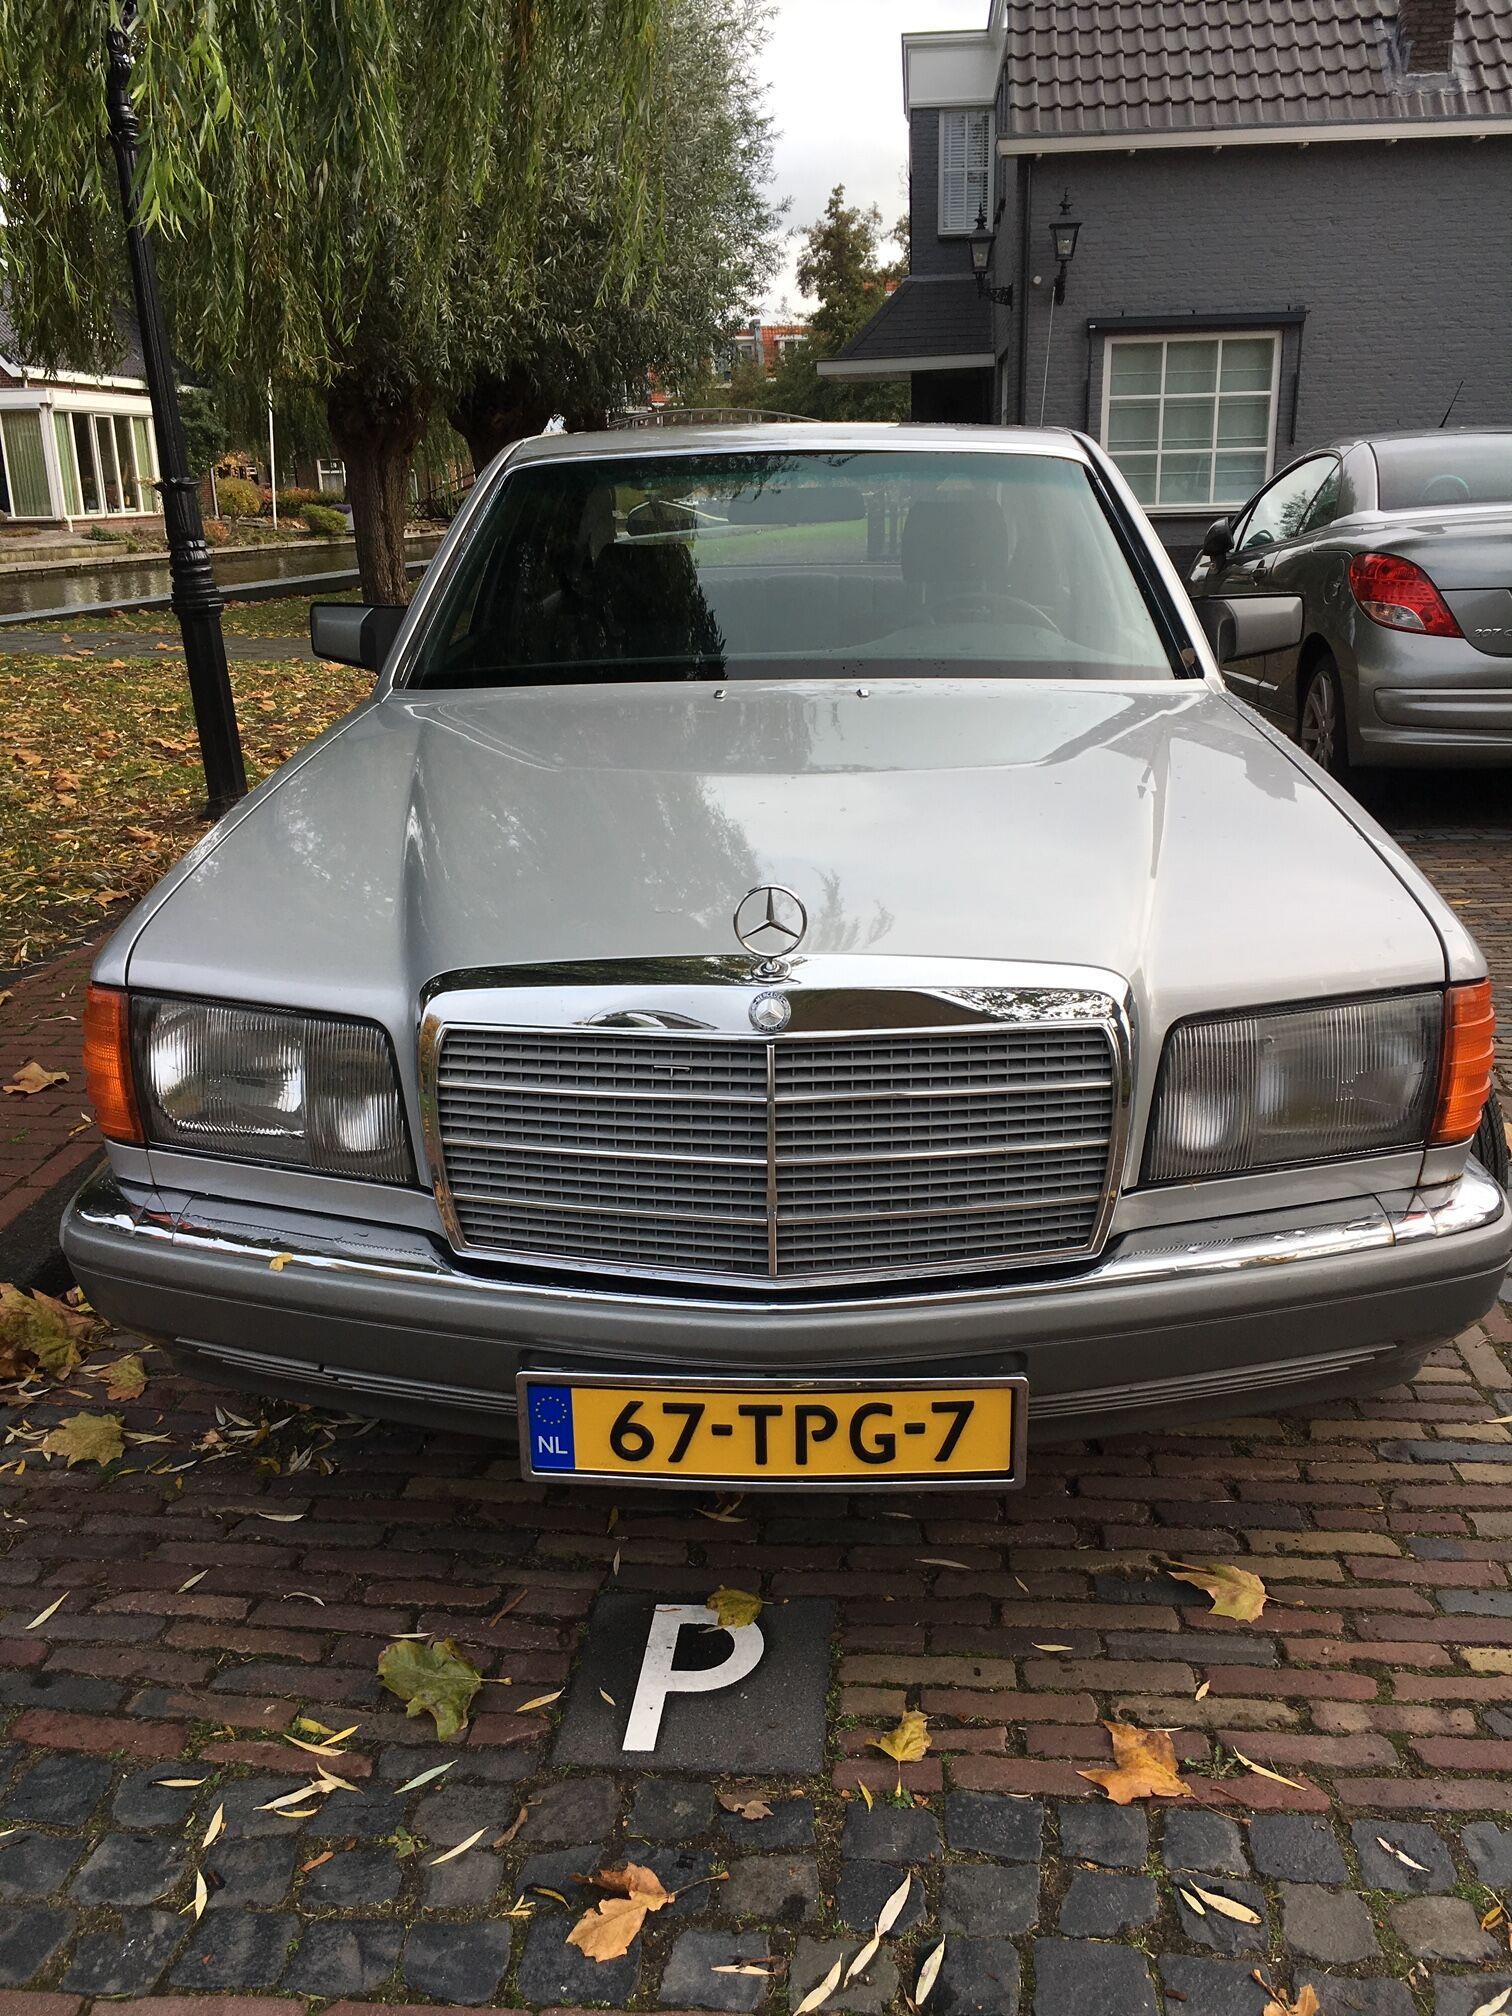 Mercedes 500 10/11